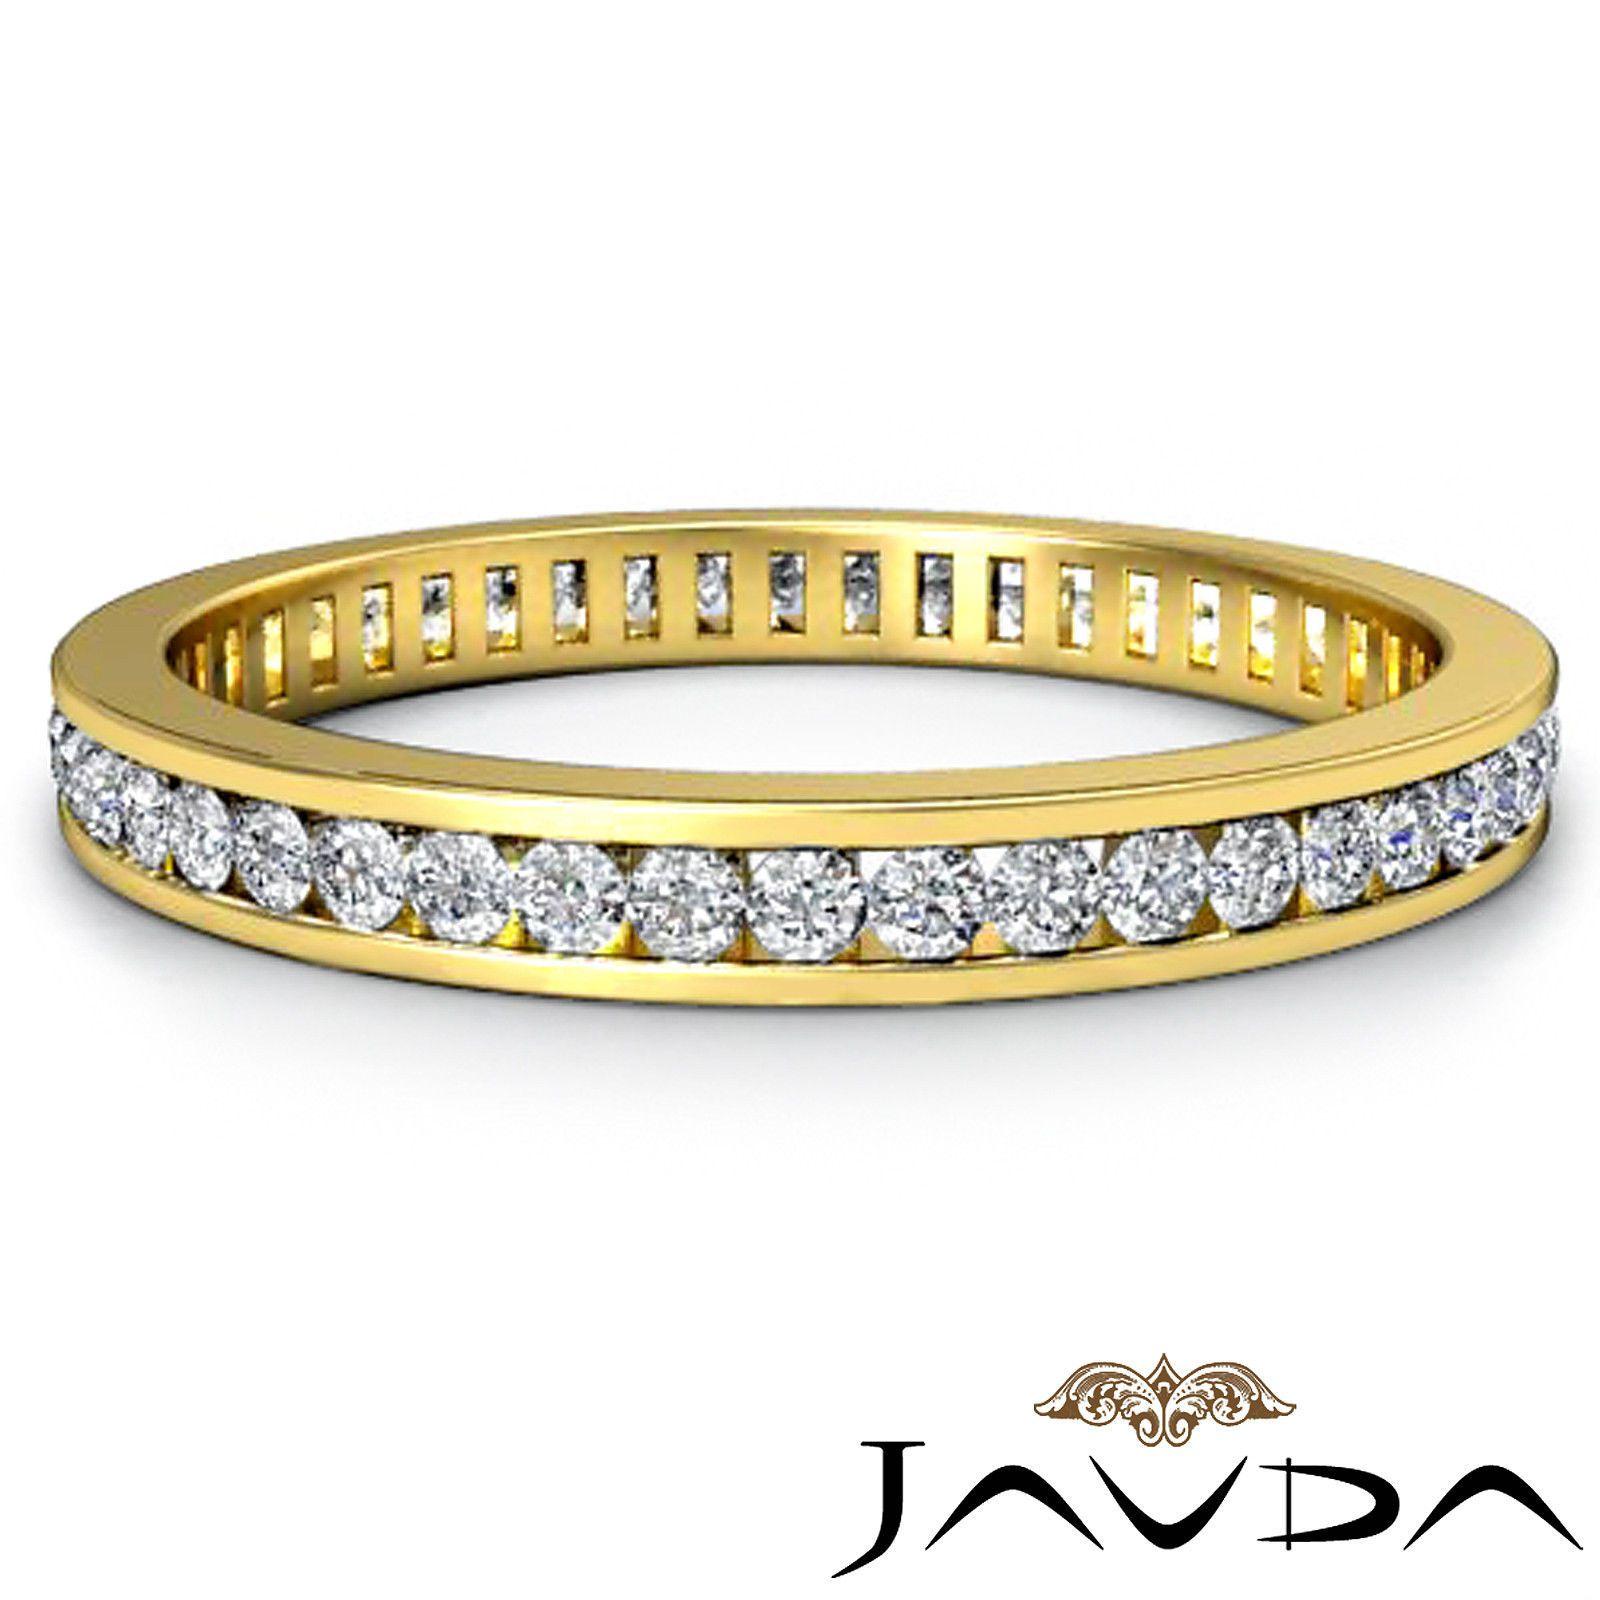 ebay wedding ring sets Womens Eternity Band Channel Set Diamond Engagement Ring 18K Yellow Gold 0 70ct eBay